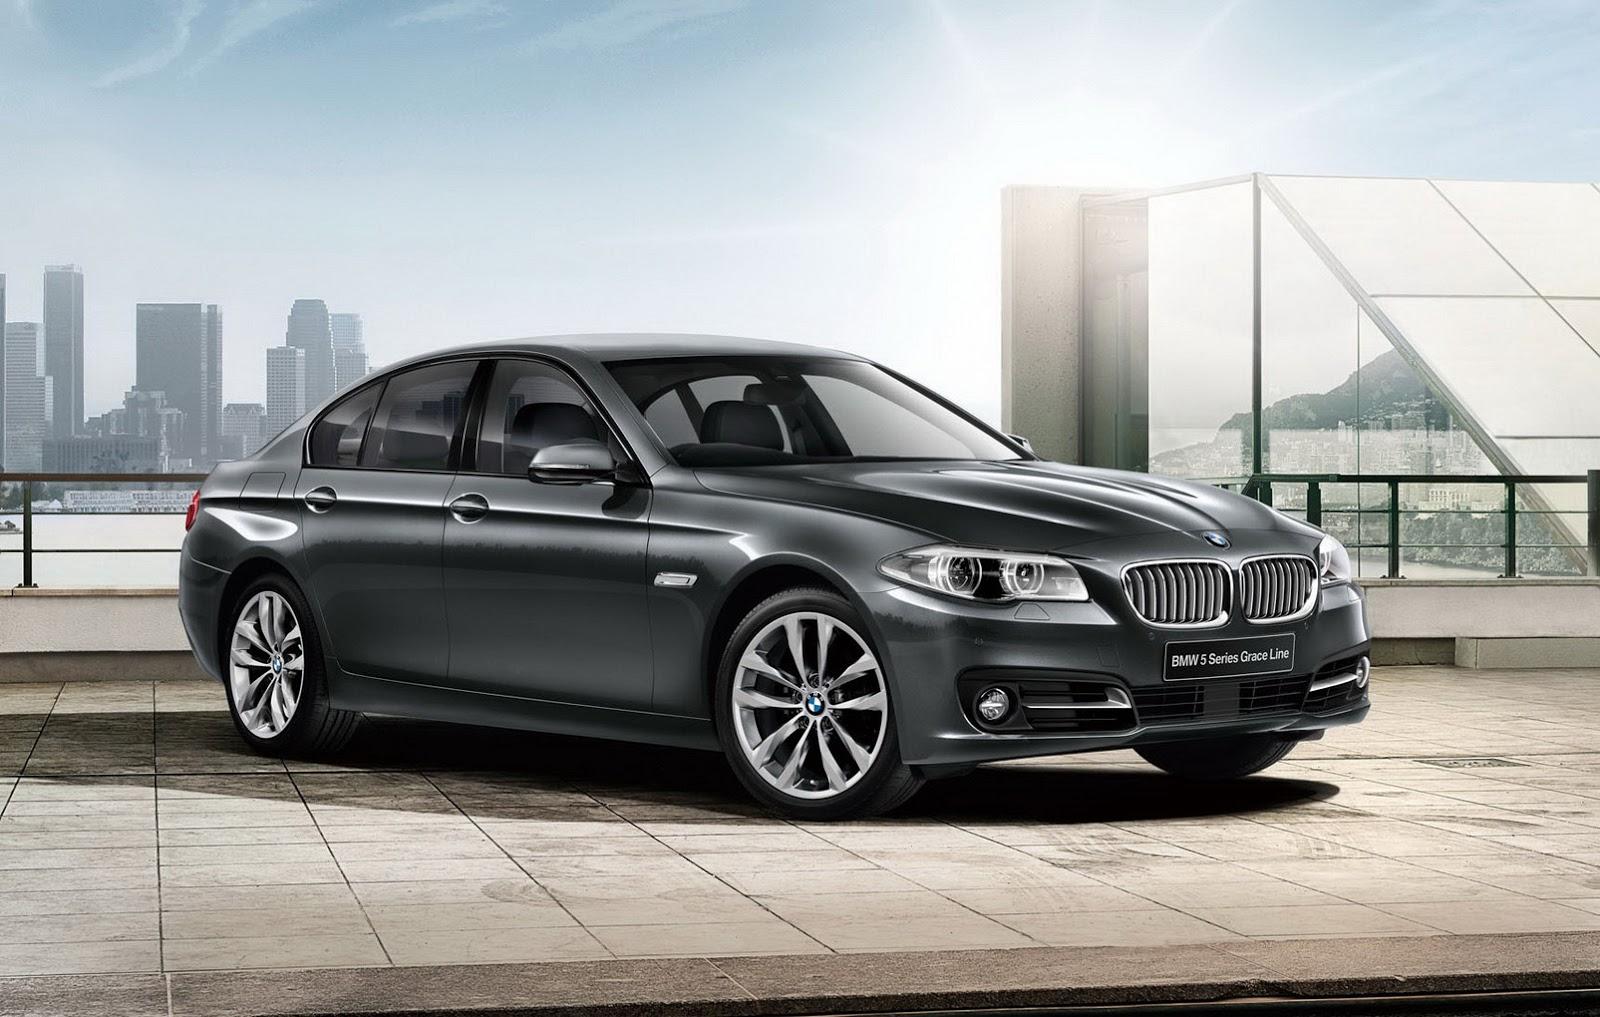 BMW 5-Series Grace Line edition